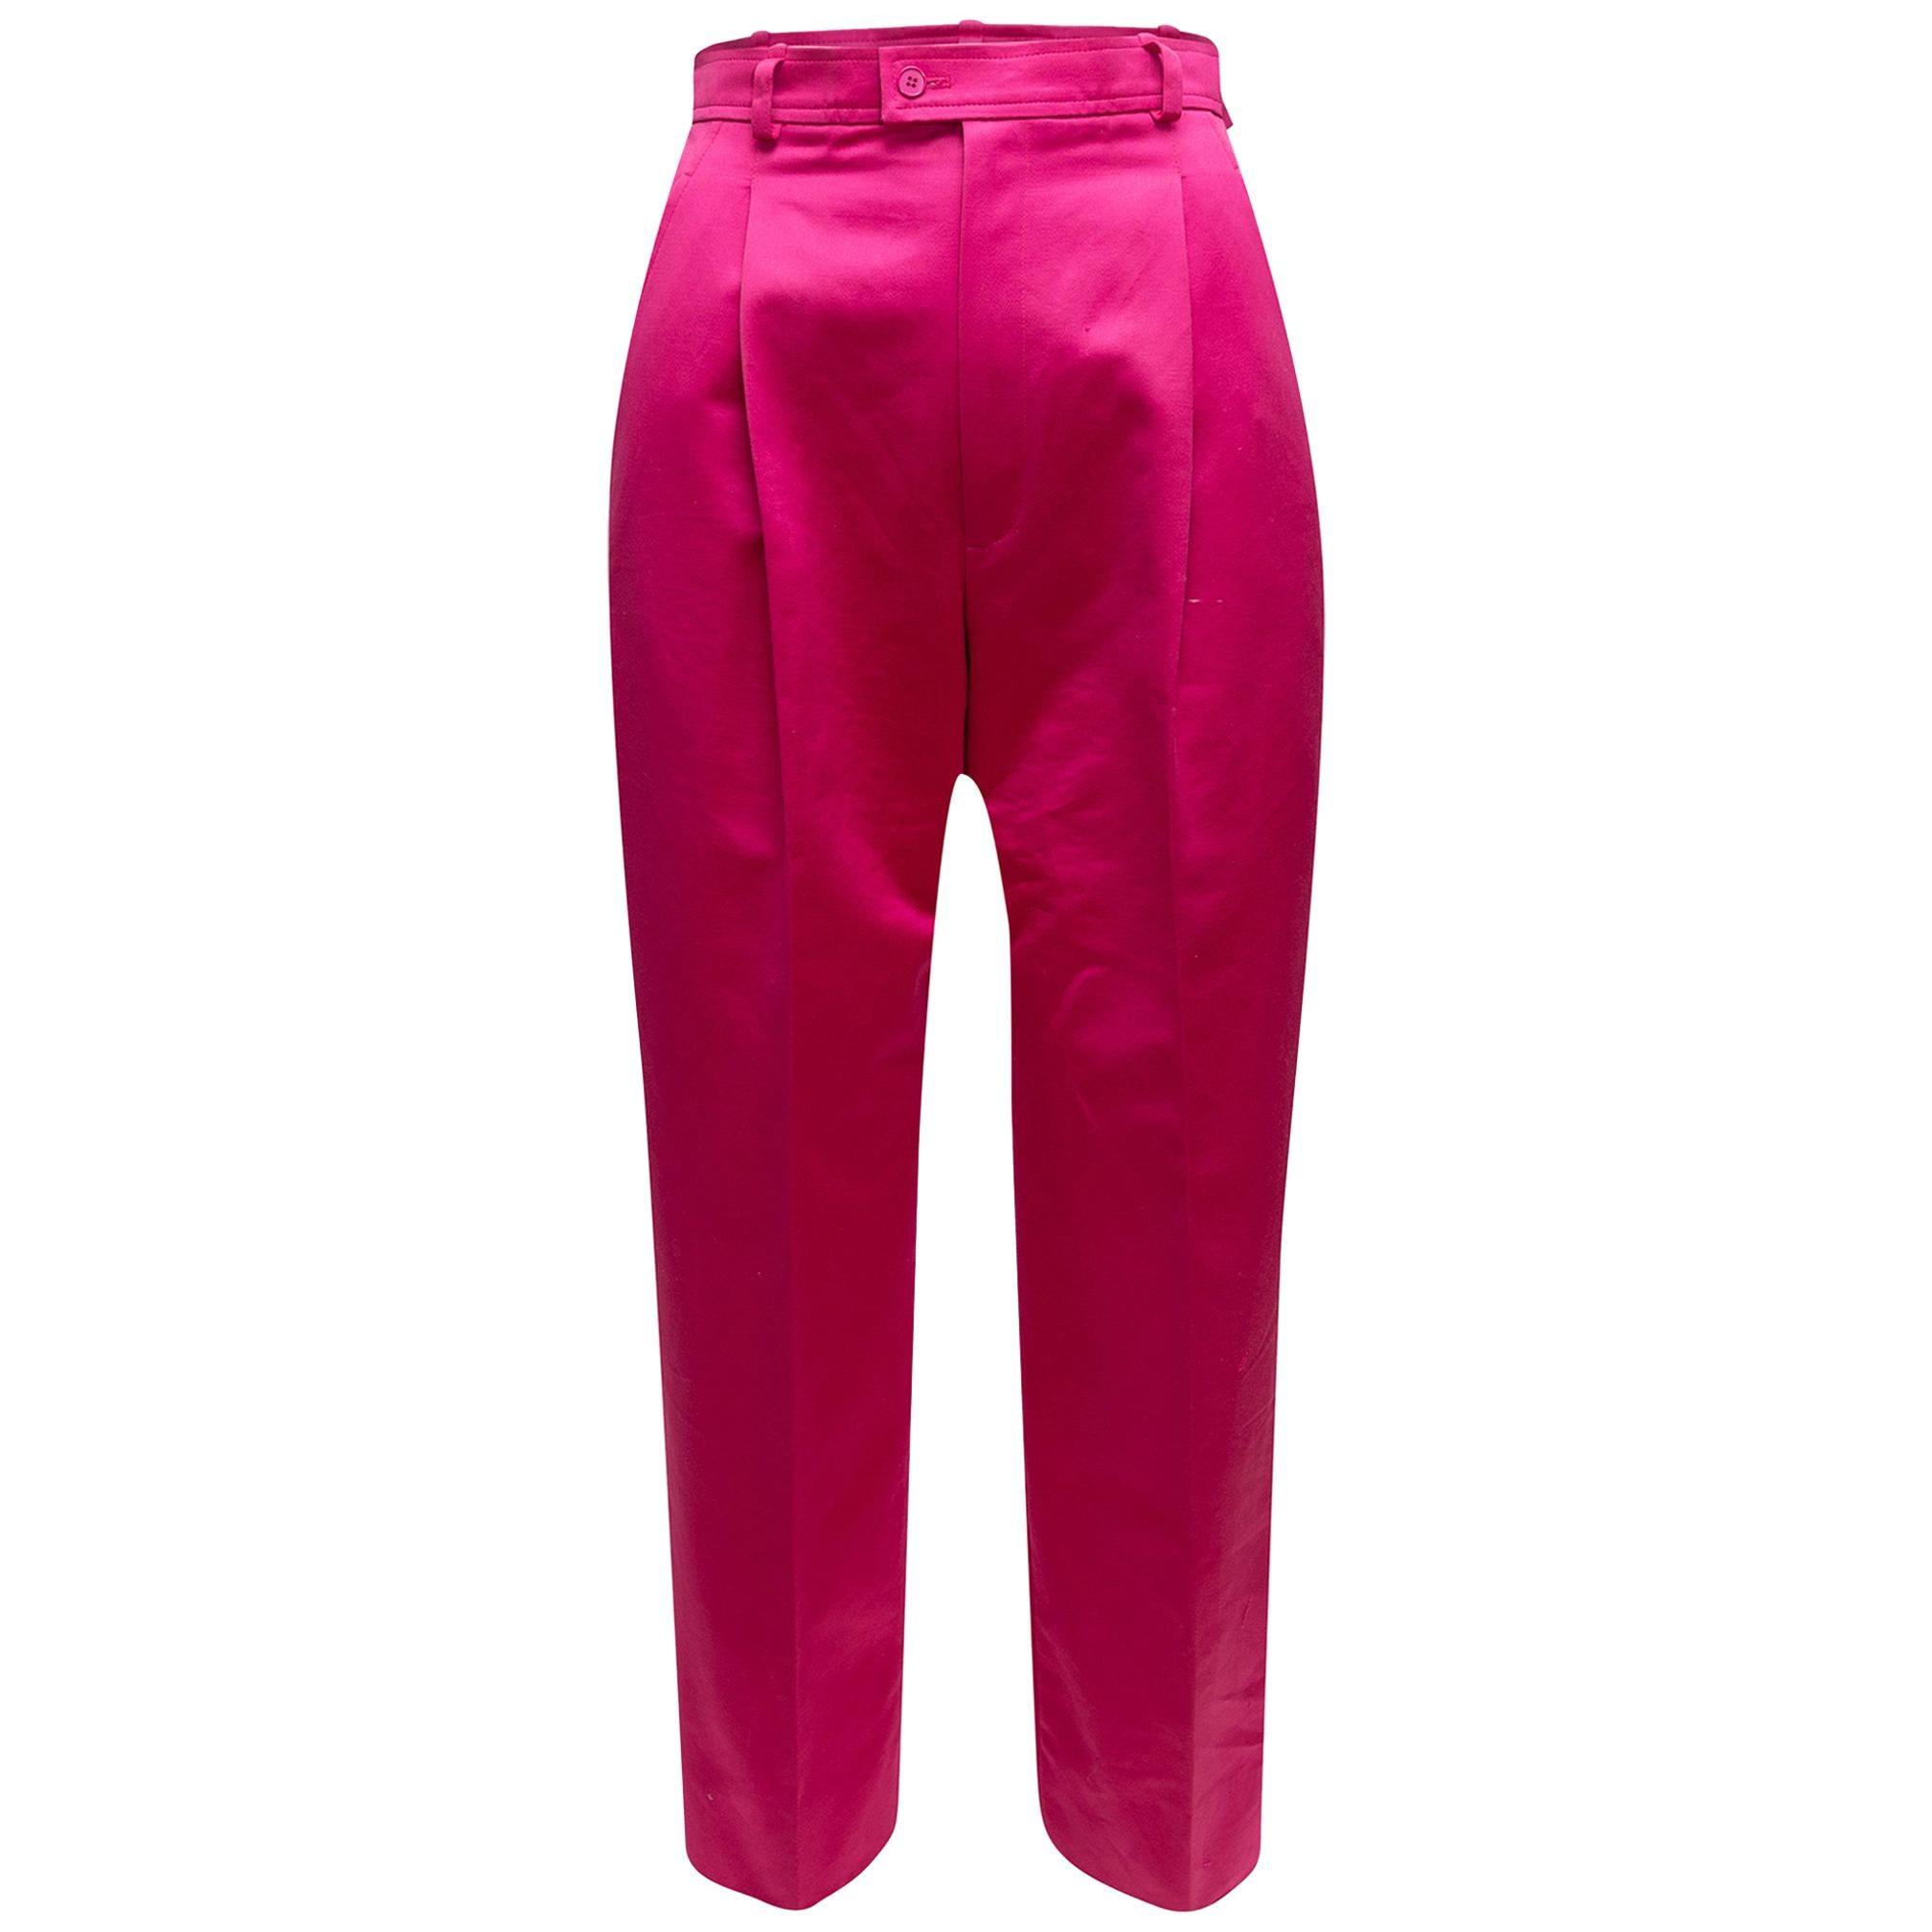 Yves Saint Laurent Hot Pink Satin Trousers